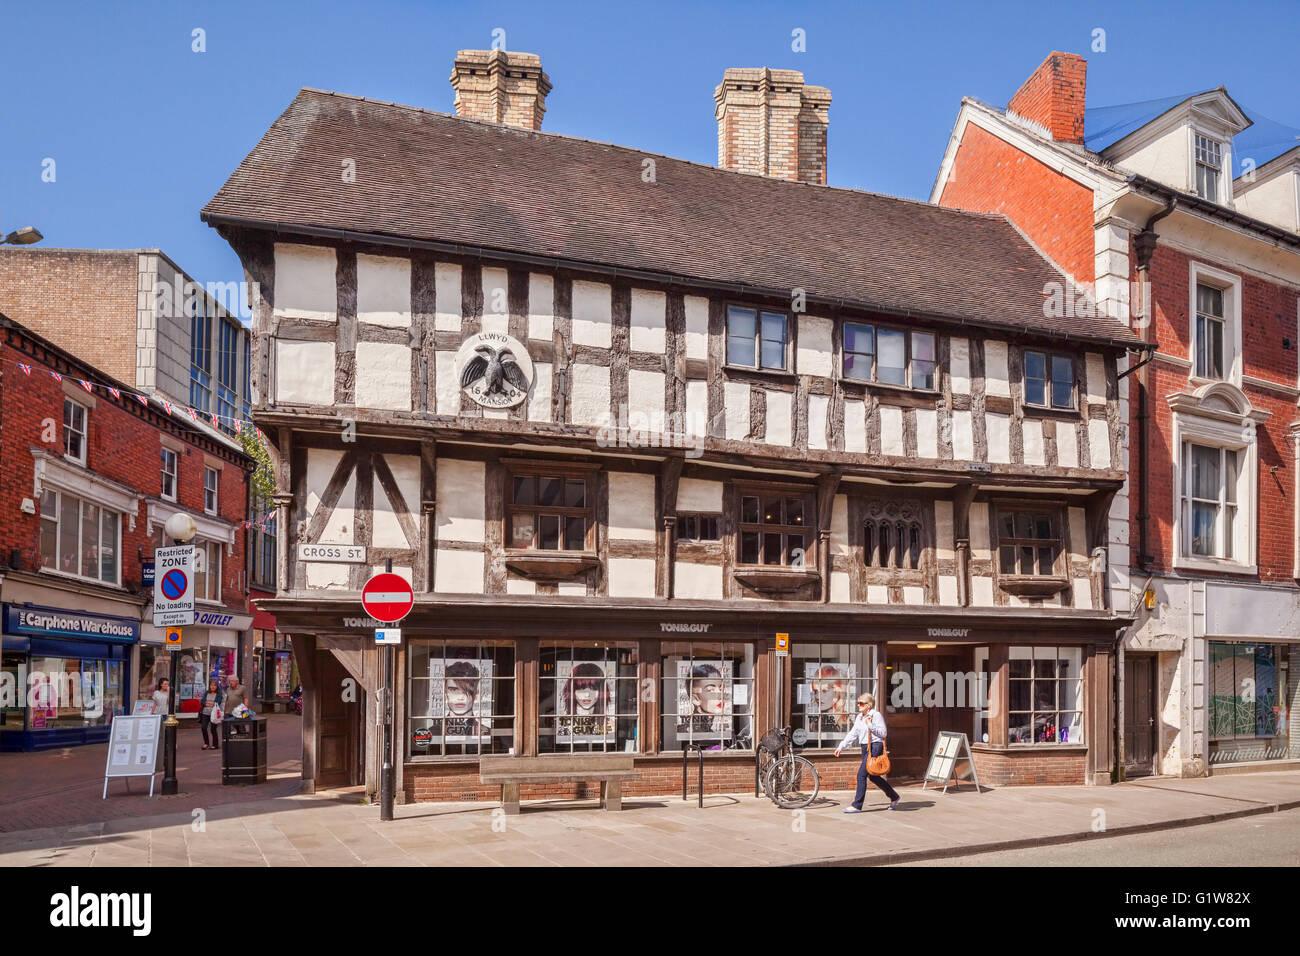 Llwyd Mansion, Cross Street, Oswestry, Shropshire, England, UK - Stock Image